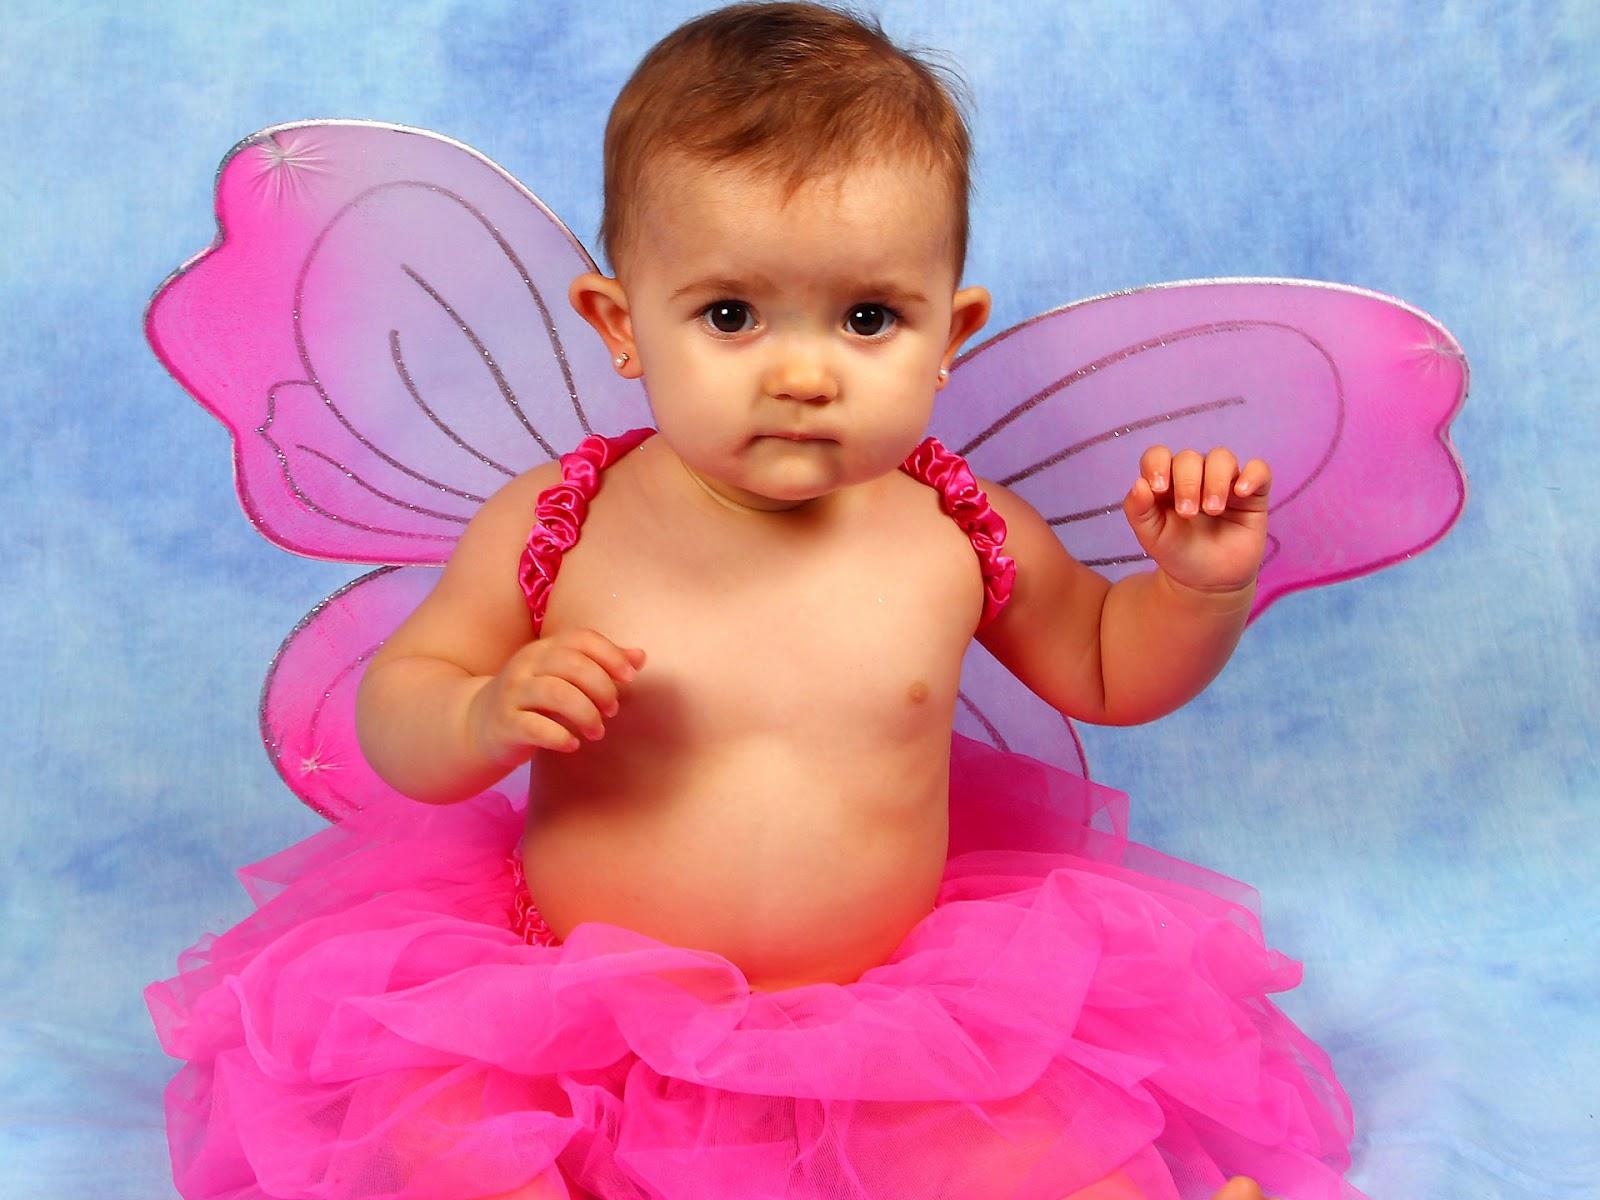 galaxy pics: cute baby girl wallpapers